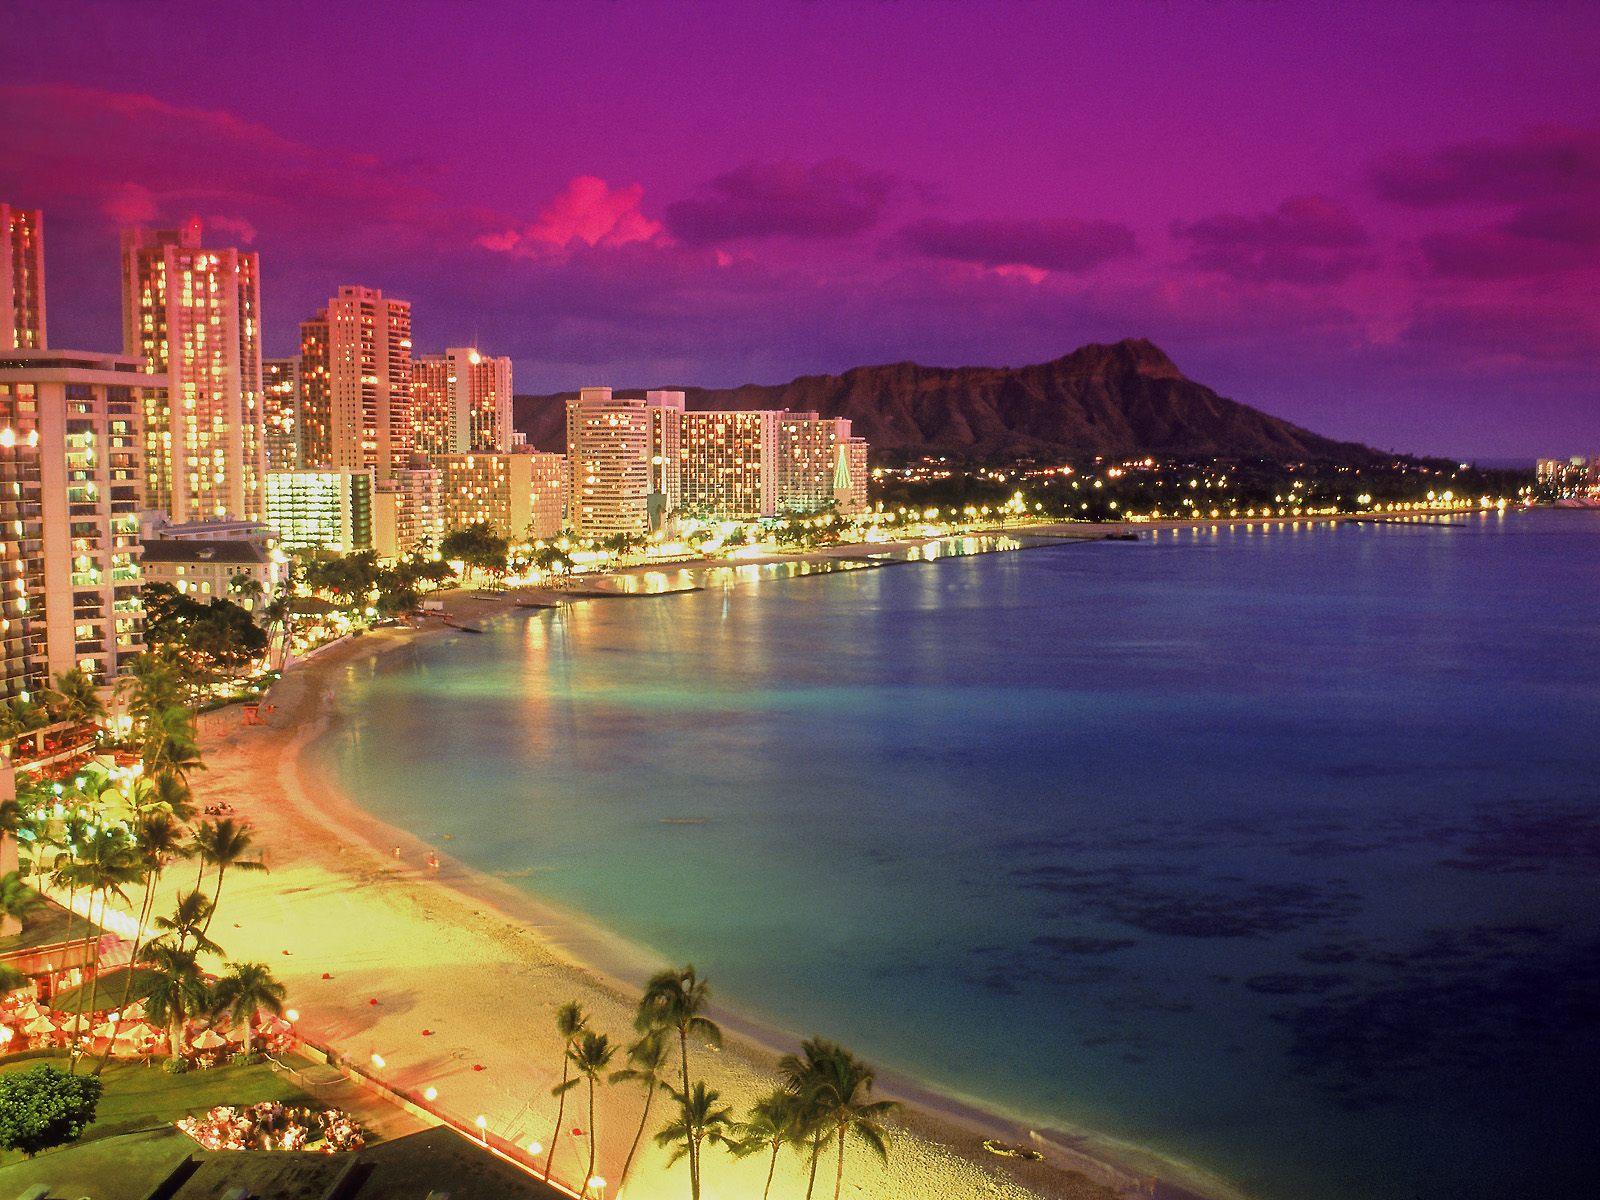 Pictures Blog: Waikiki Beach, Oahu, Hawaii